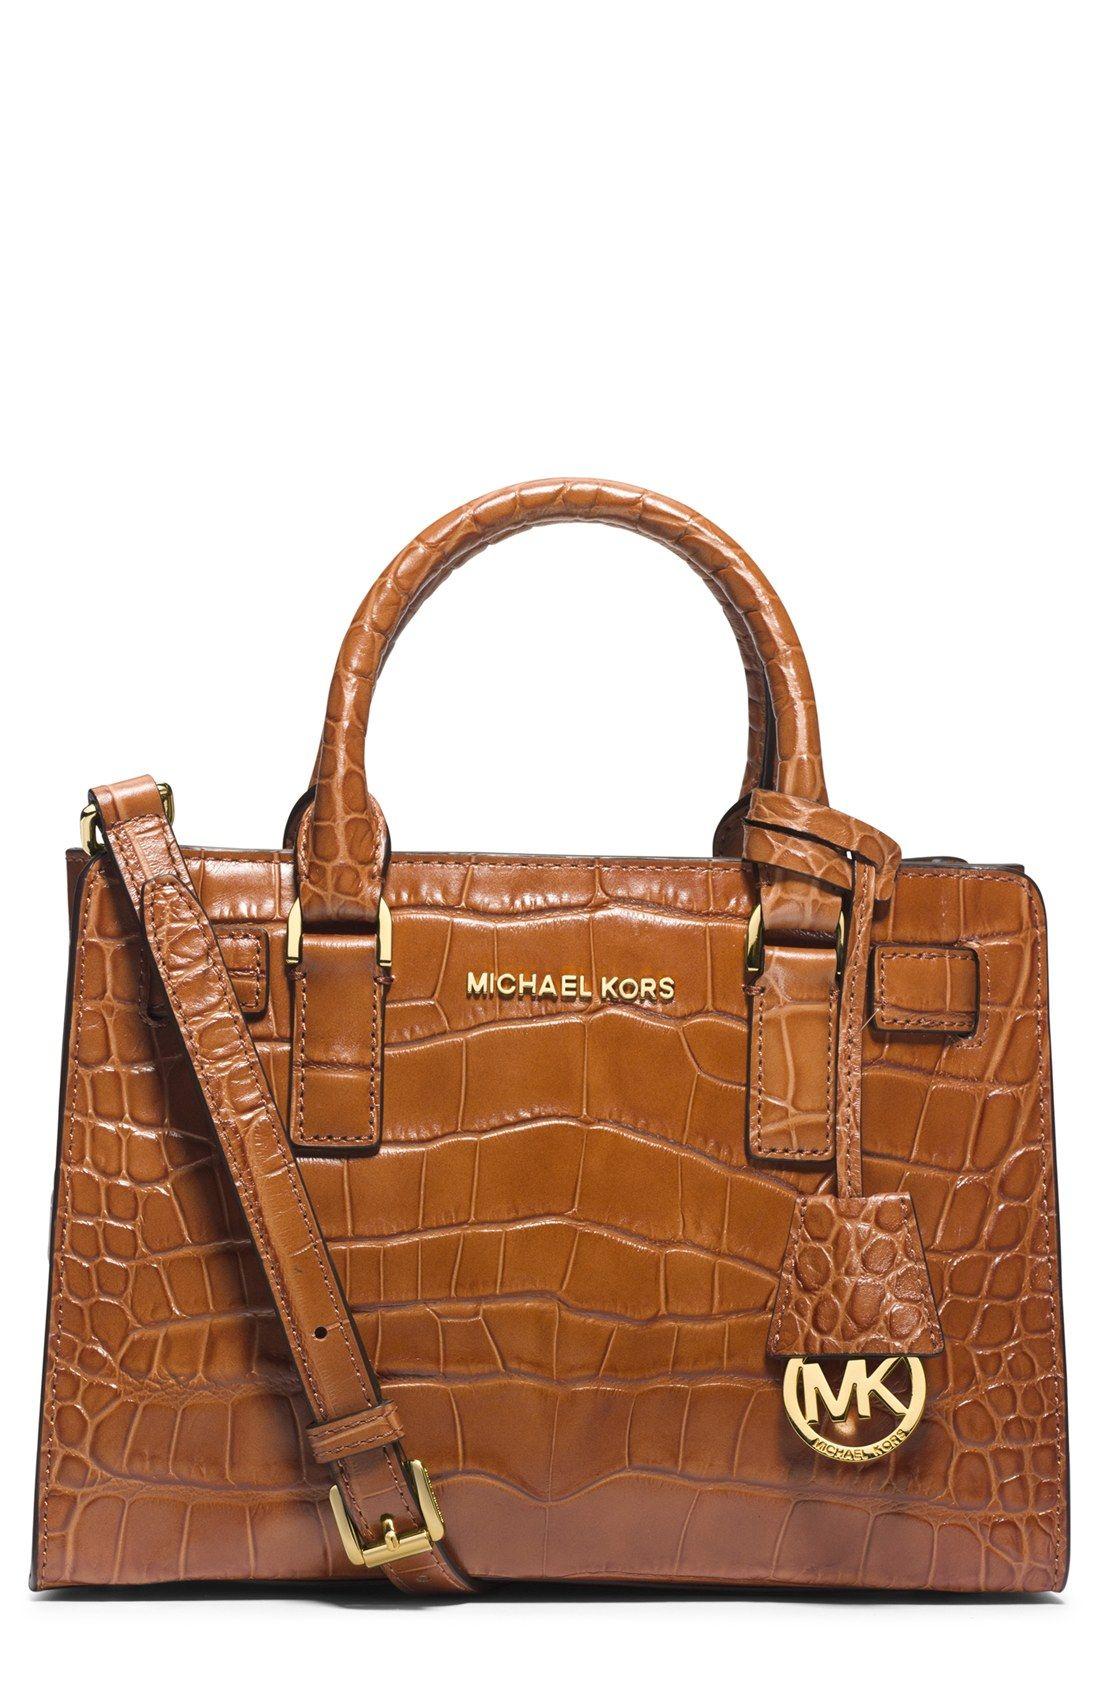 New Michael Kors satchel on the wishlist  ).   Fall Fashion ... 4a46c3228b